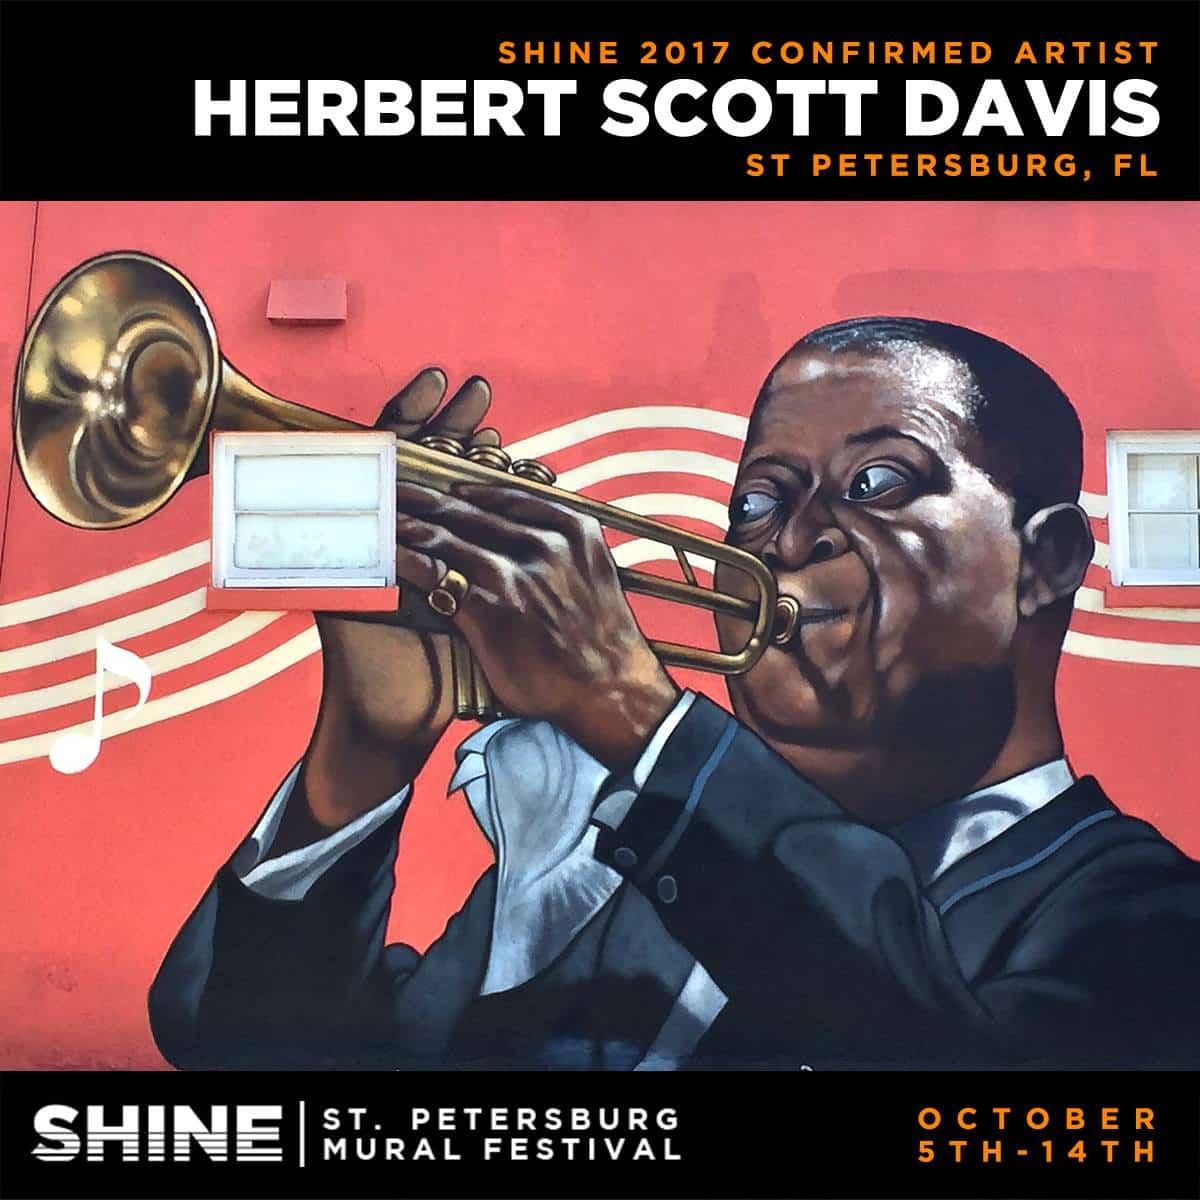 SHINE artist - Hebert Scott Davis